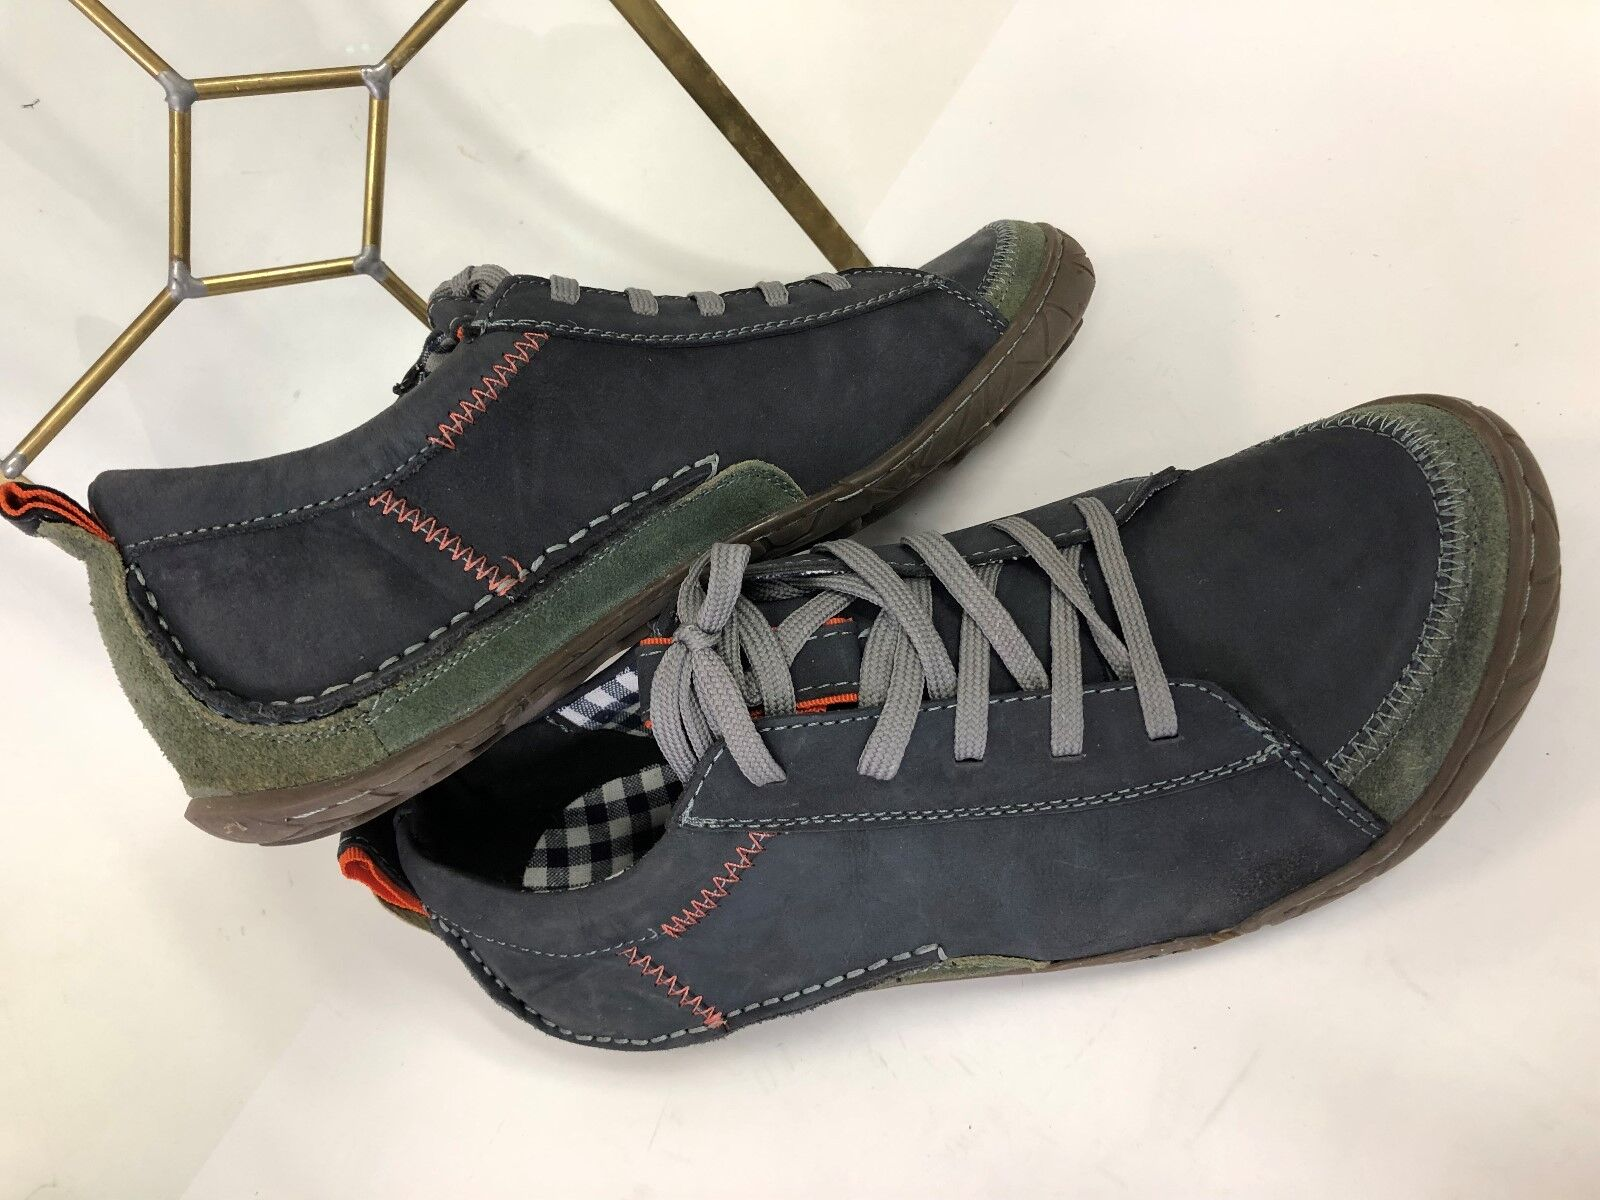 MUK LUKS BRYAN Mocasines Talla 11 Para Hombre Zapato De Cuero Nobuck Azul Usado En Excelente Condición